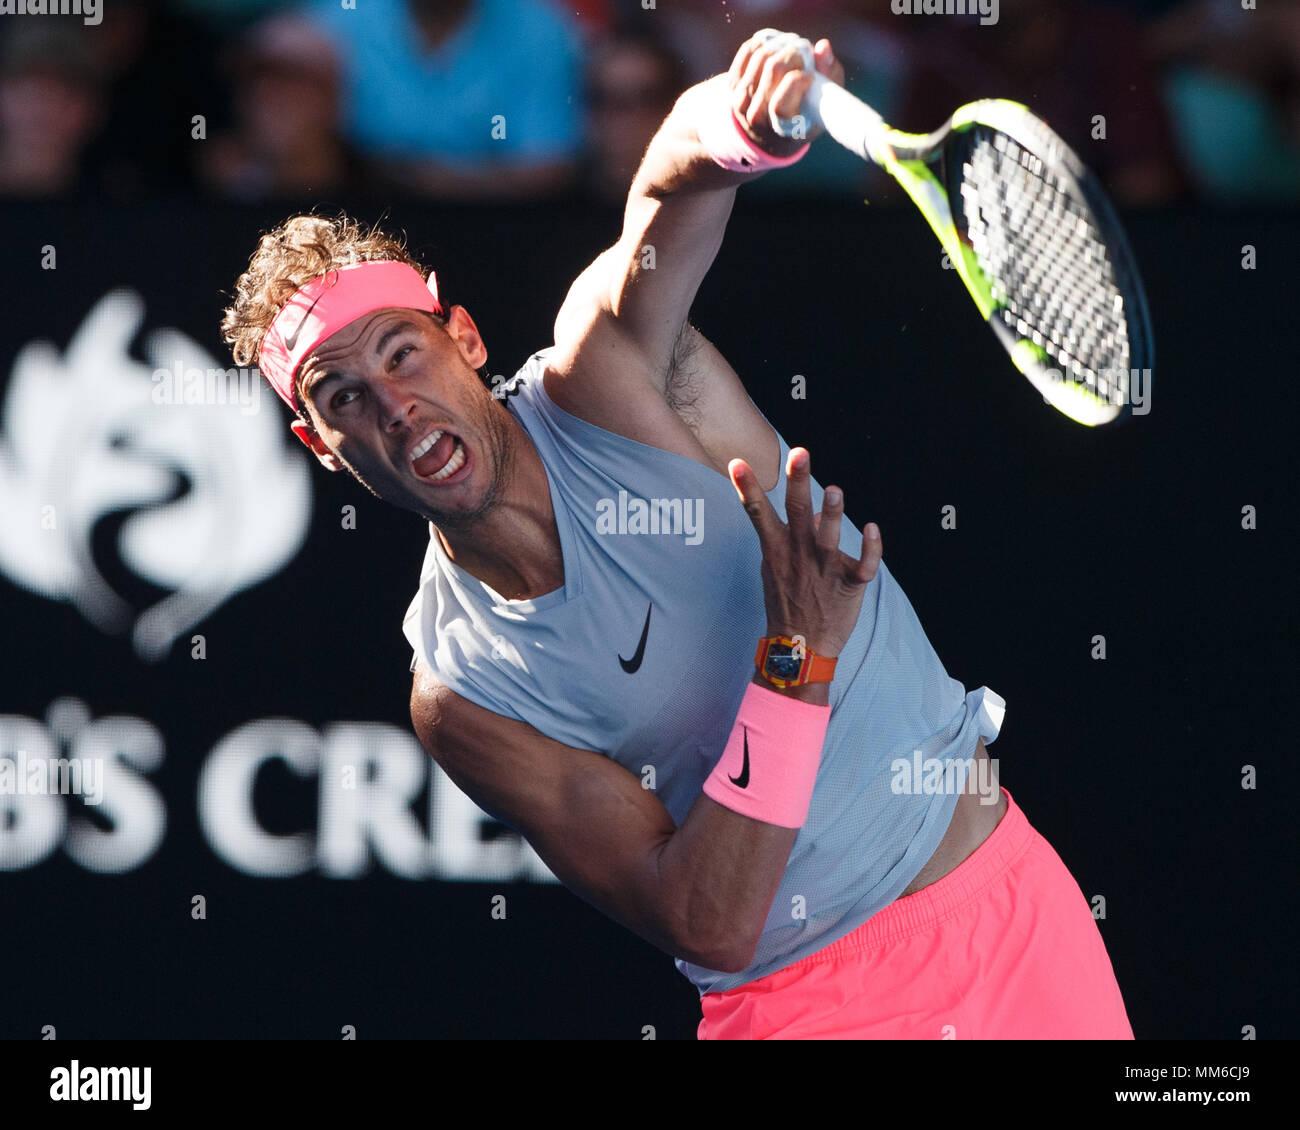 Spanish tennis player Rafael Nadal  playing service shot at Australian Open 2018 Tennis Tournament, Melbourne Park, Melbourne, Victoria, Australia. Stock Photo